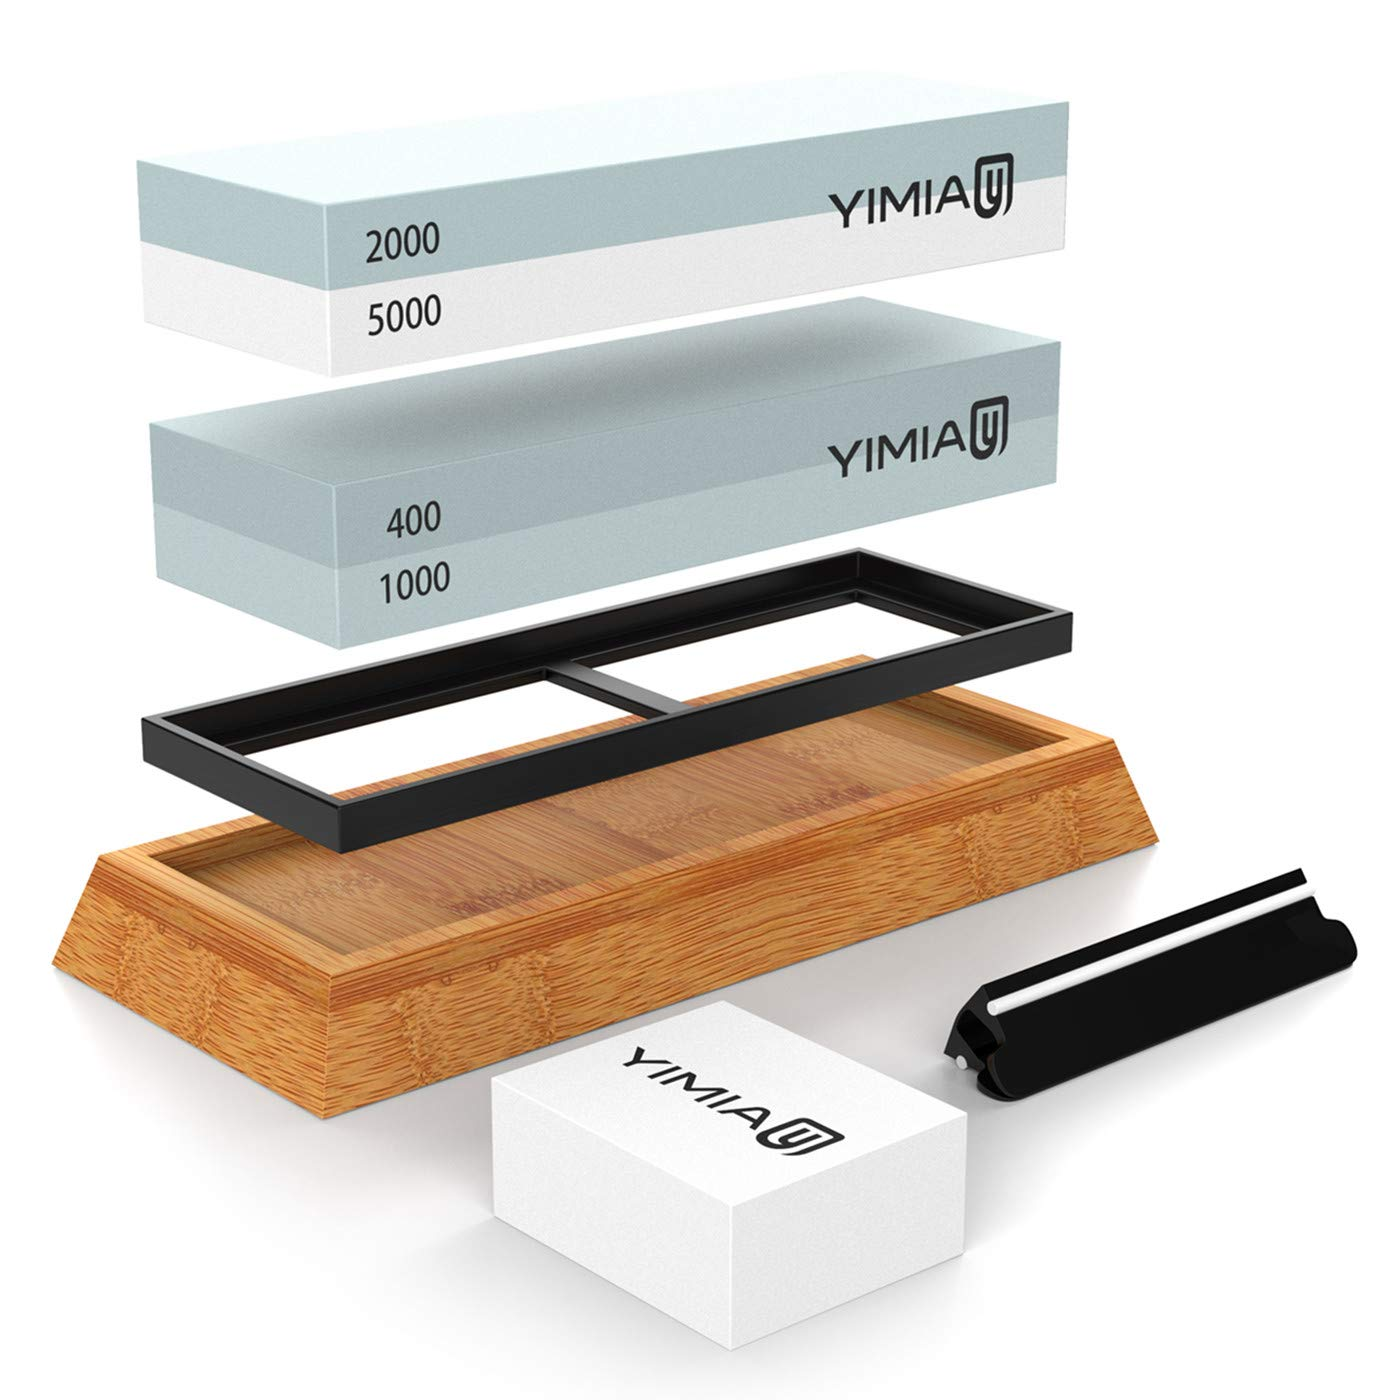 Premium Knife Sharpening Stone Kit, YIMIA 4 Side Grit 400/1000 2000/5000 Whetstone, Knife Sharpener Waterstone with Non-Slip Bamboo Base & Flattening Stone & Angle Guide